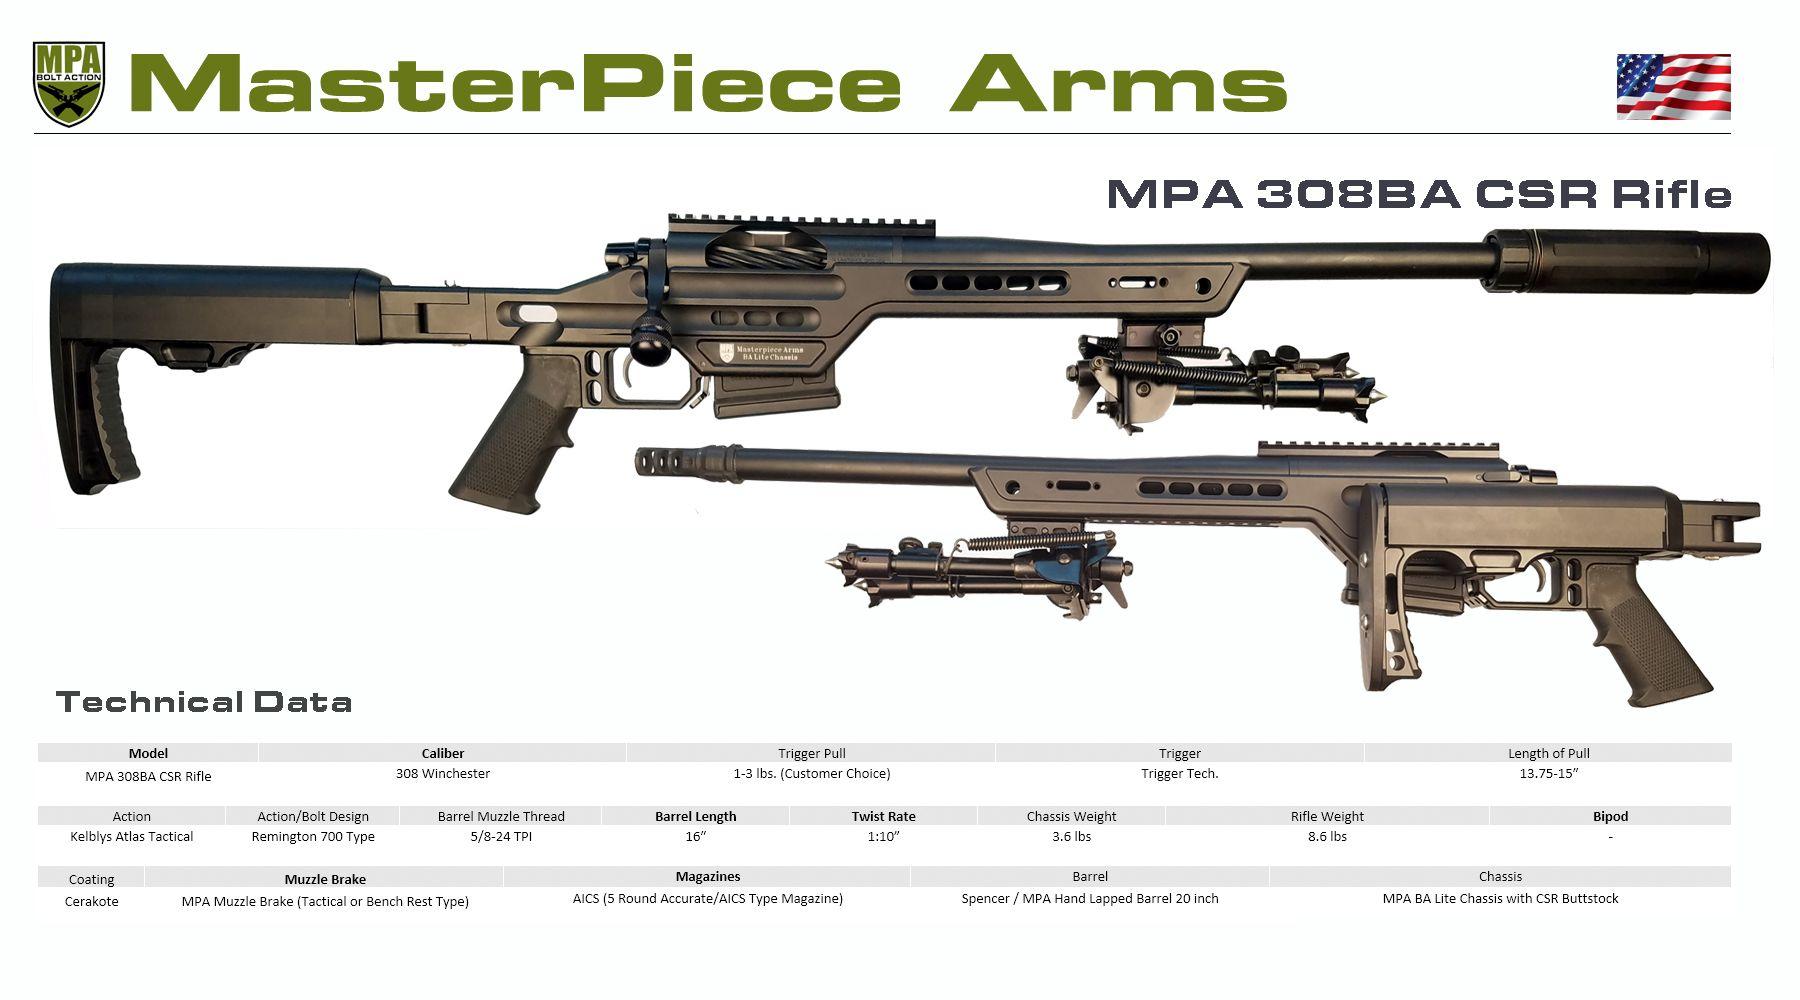 Masterpiece Arms - MPA 308BA CSR Rifle | G | Guns, Weapons